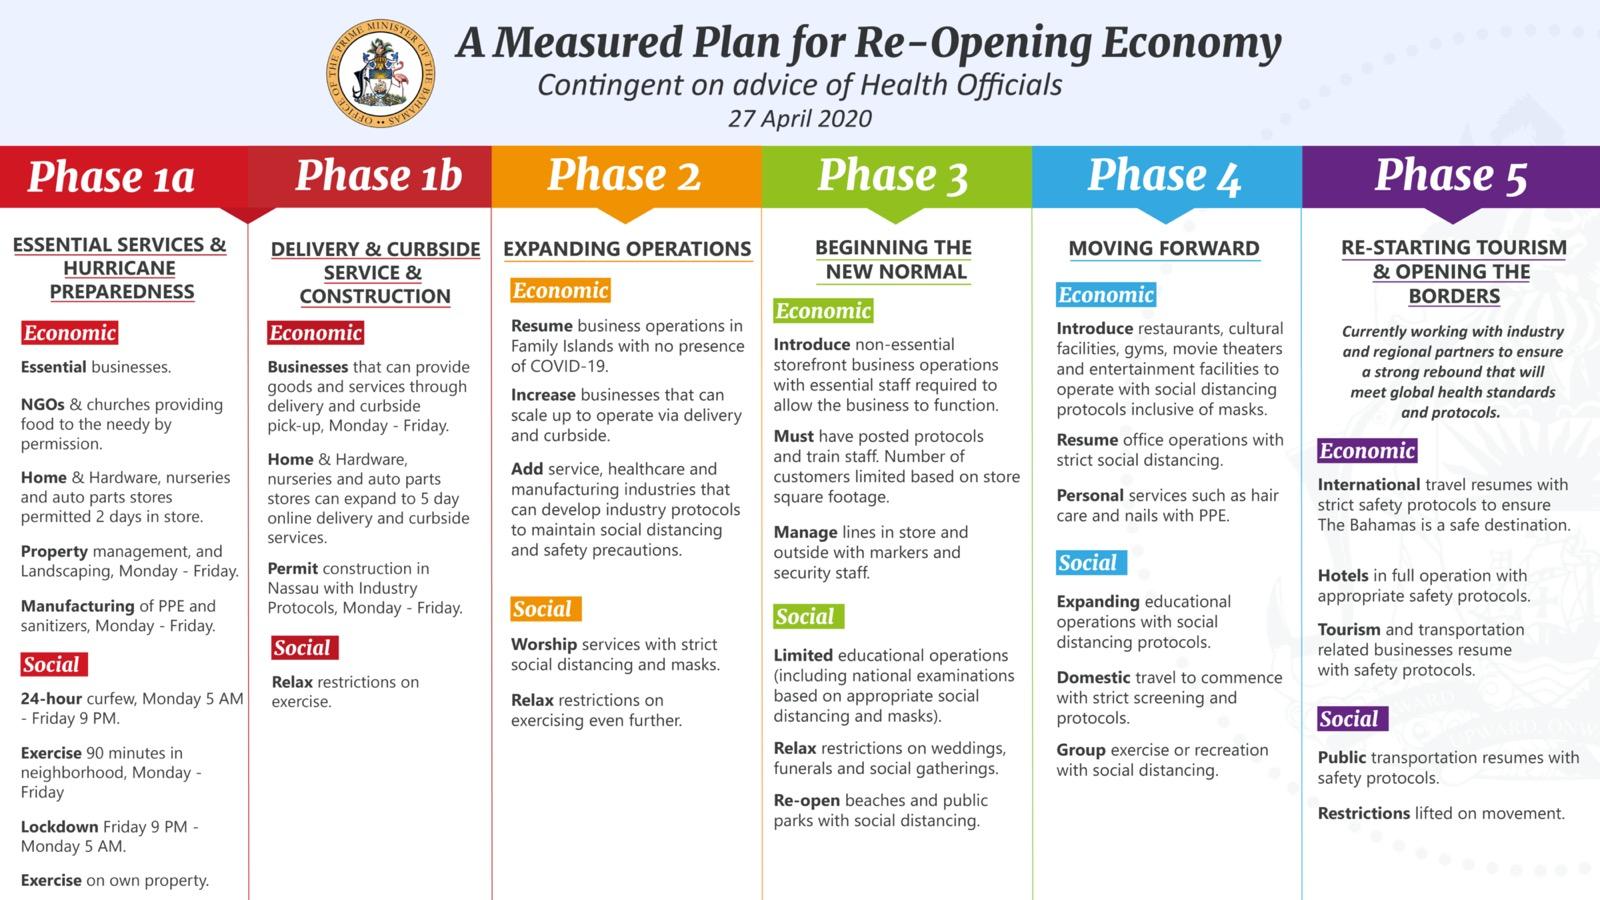 Phased Re-opening Plan